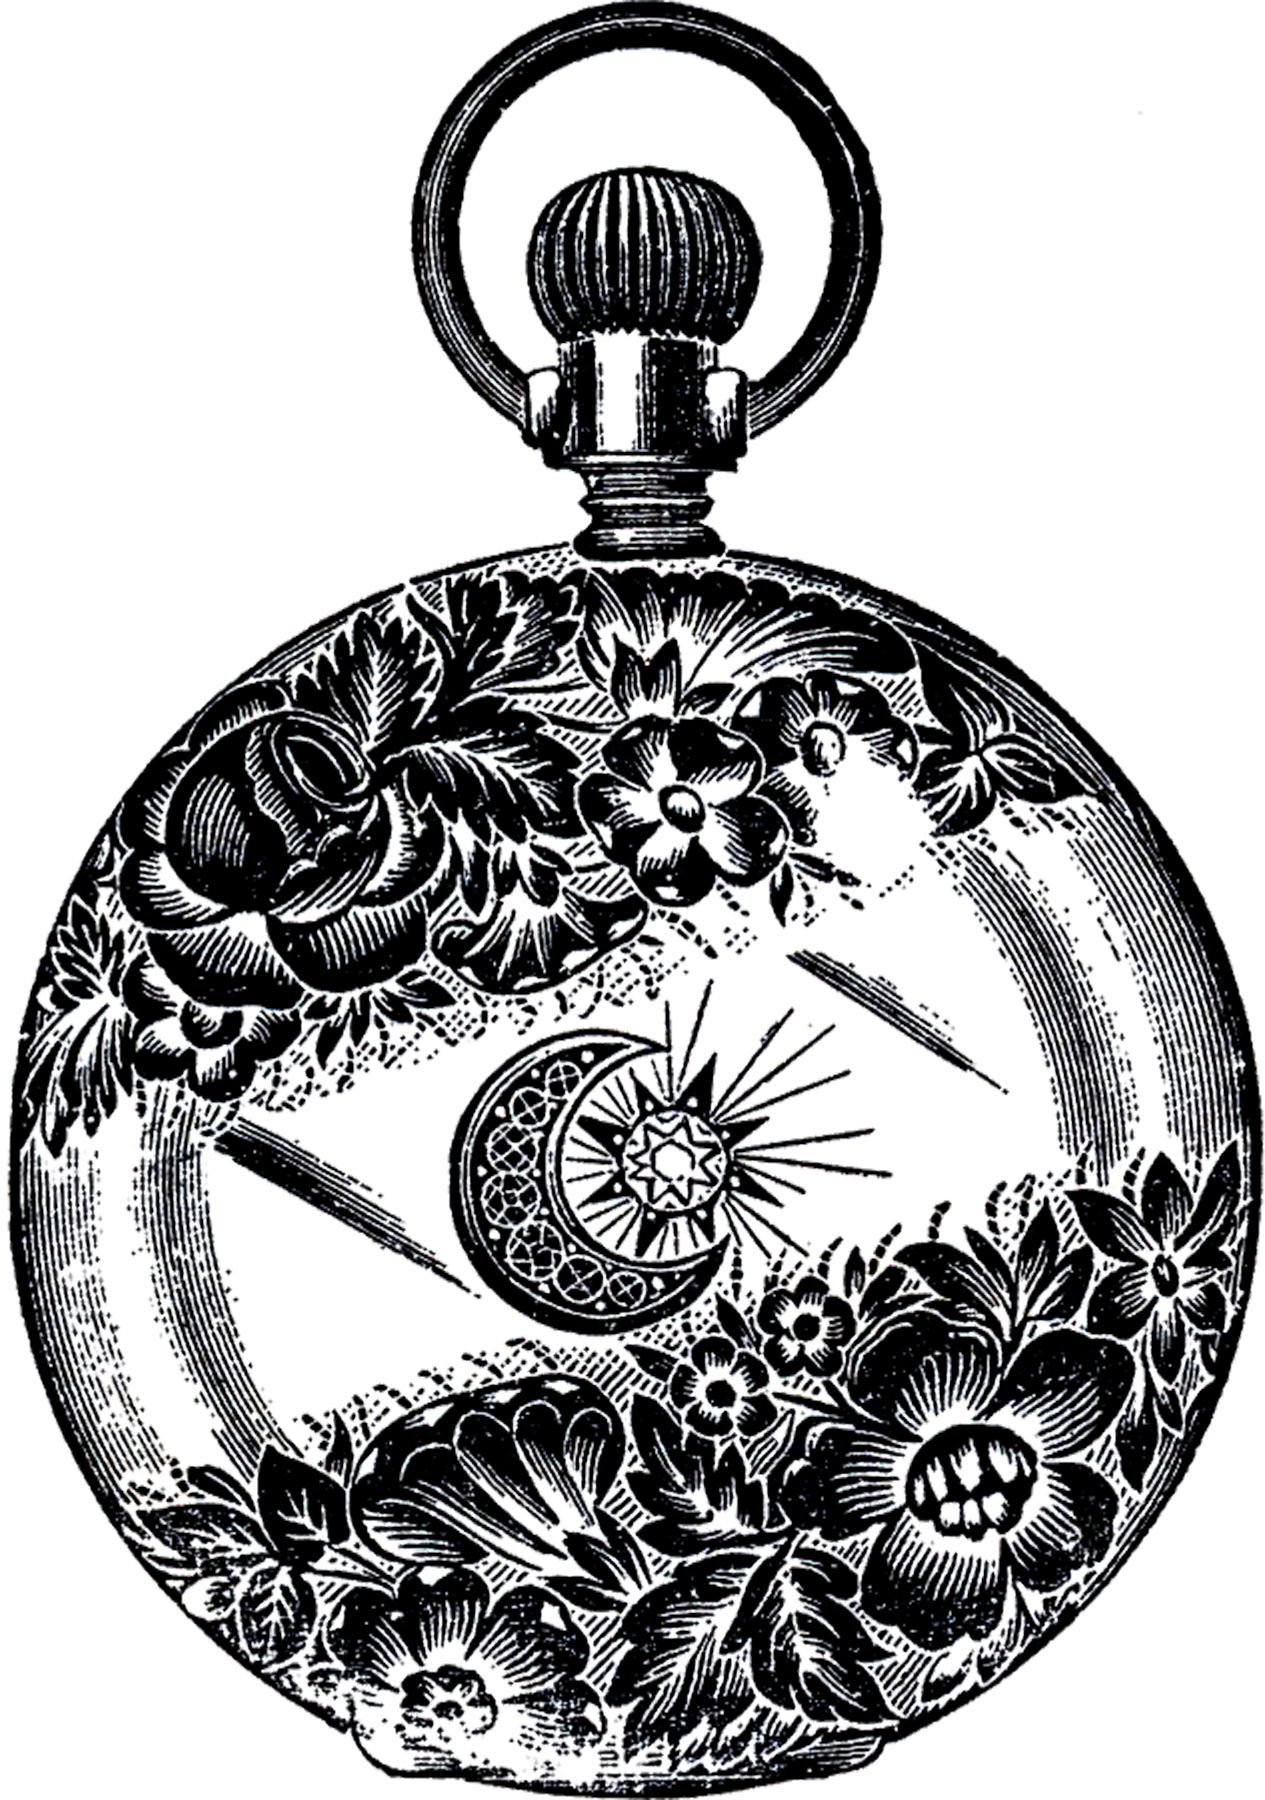 Public Domain Pocket Watch Image Fancy! Graphics fairy